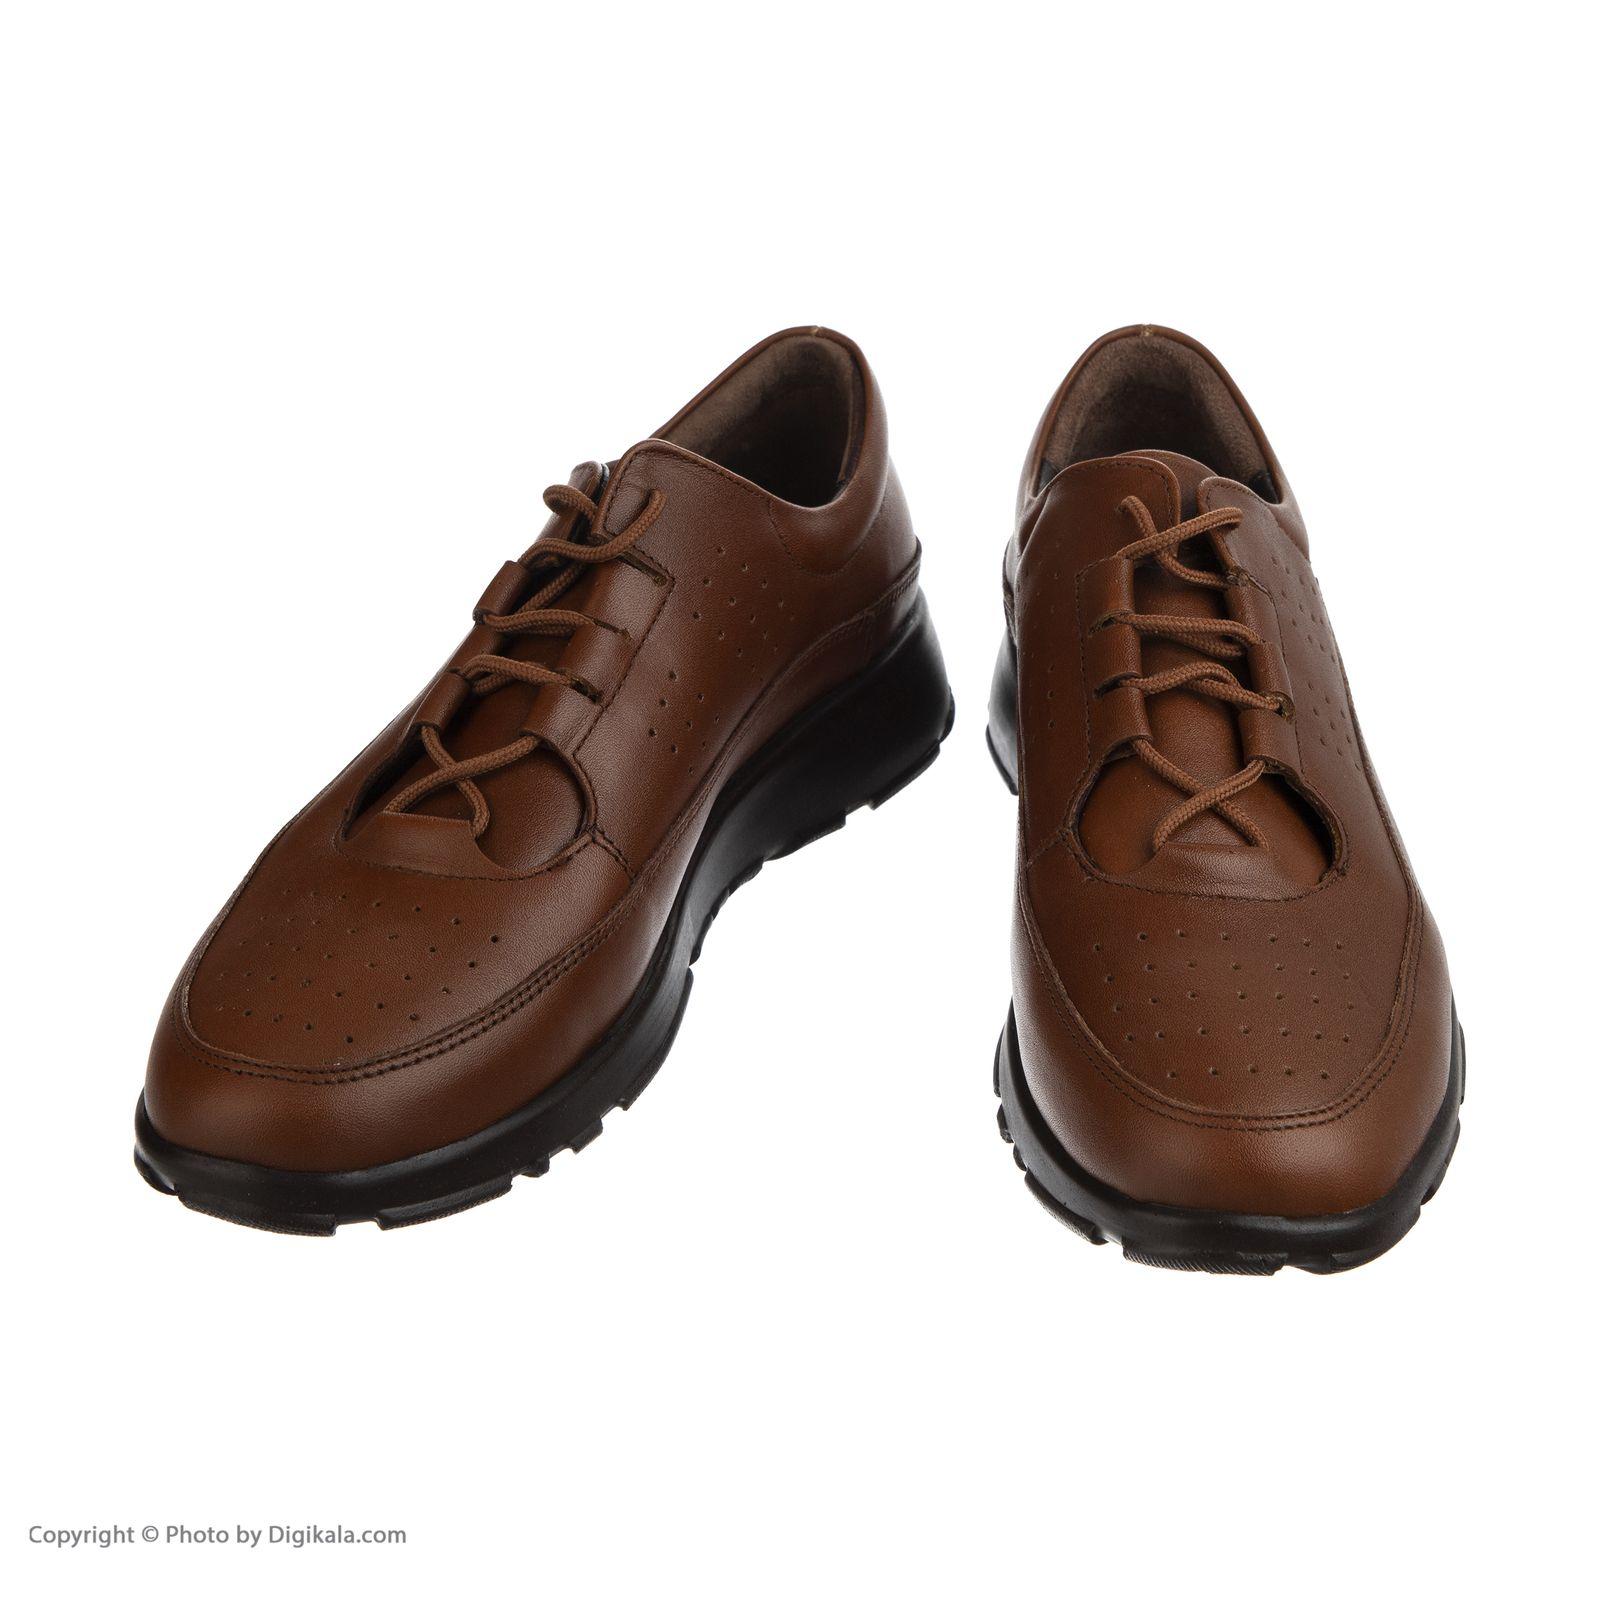 کفش روزمره زنانه شیفر مدل 5289A500136 -  - 6